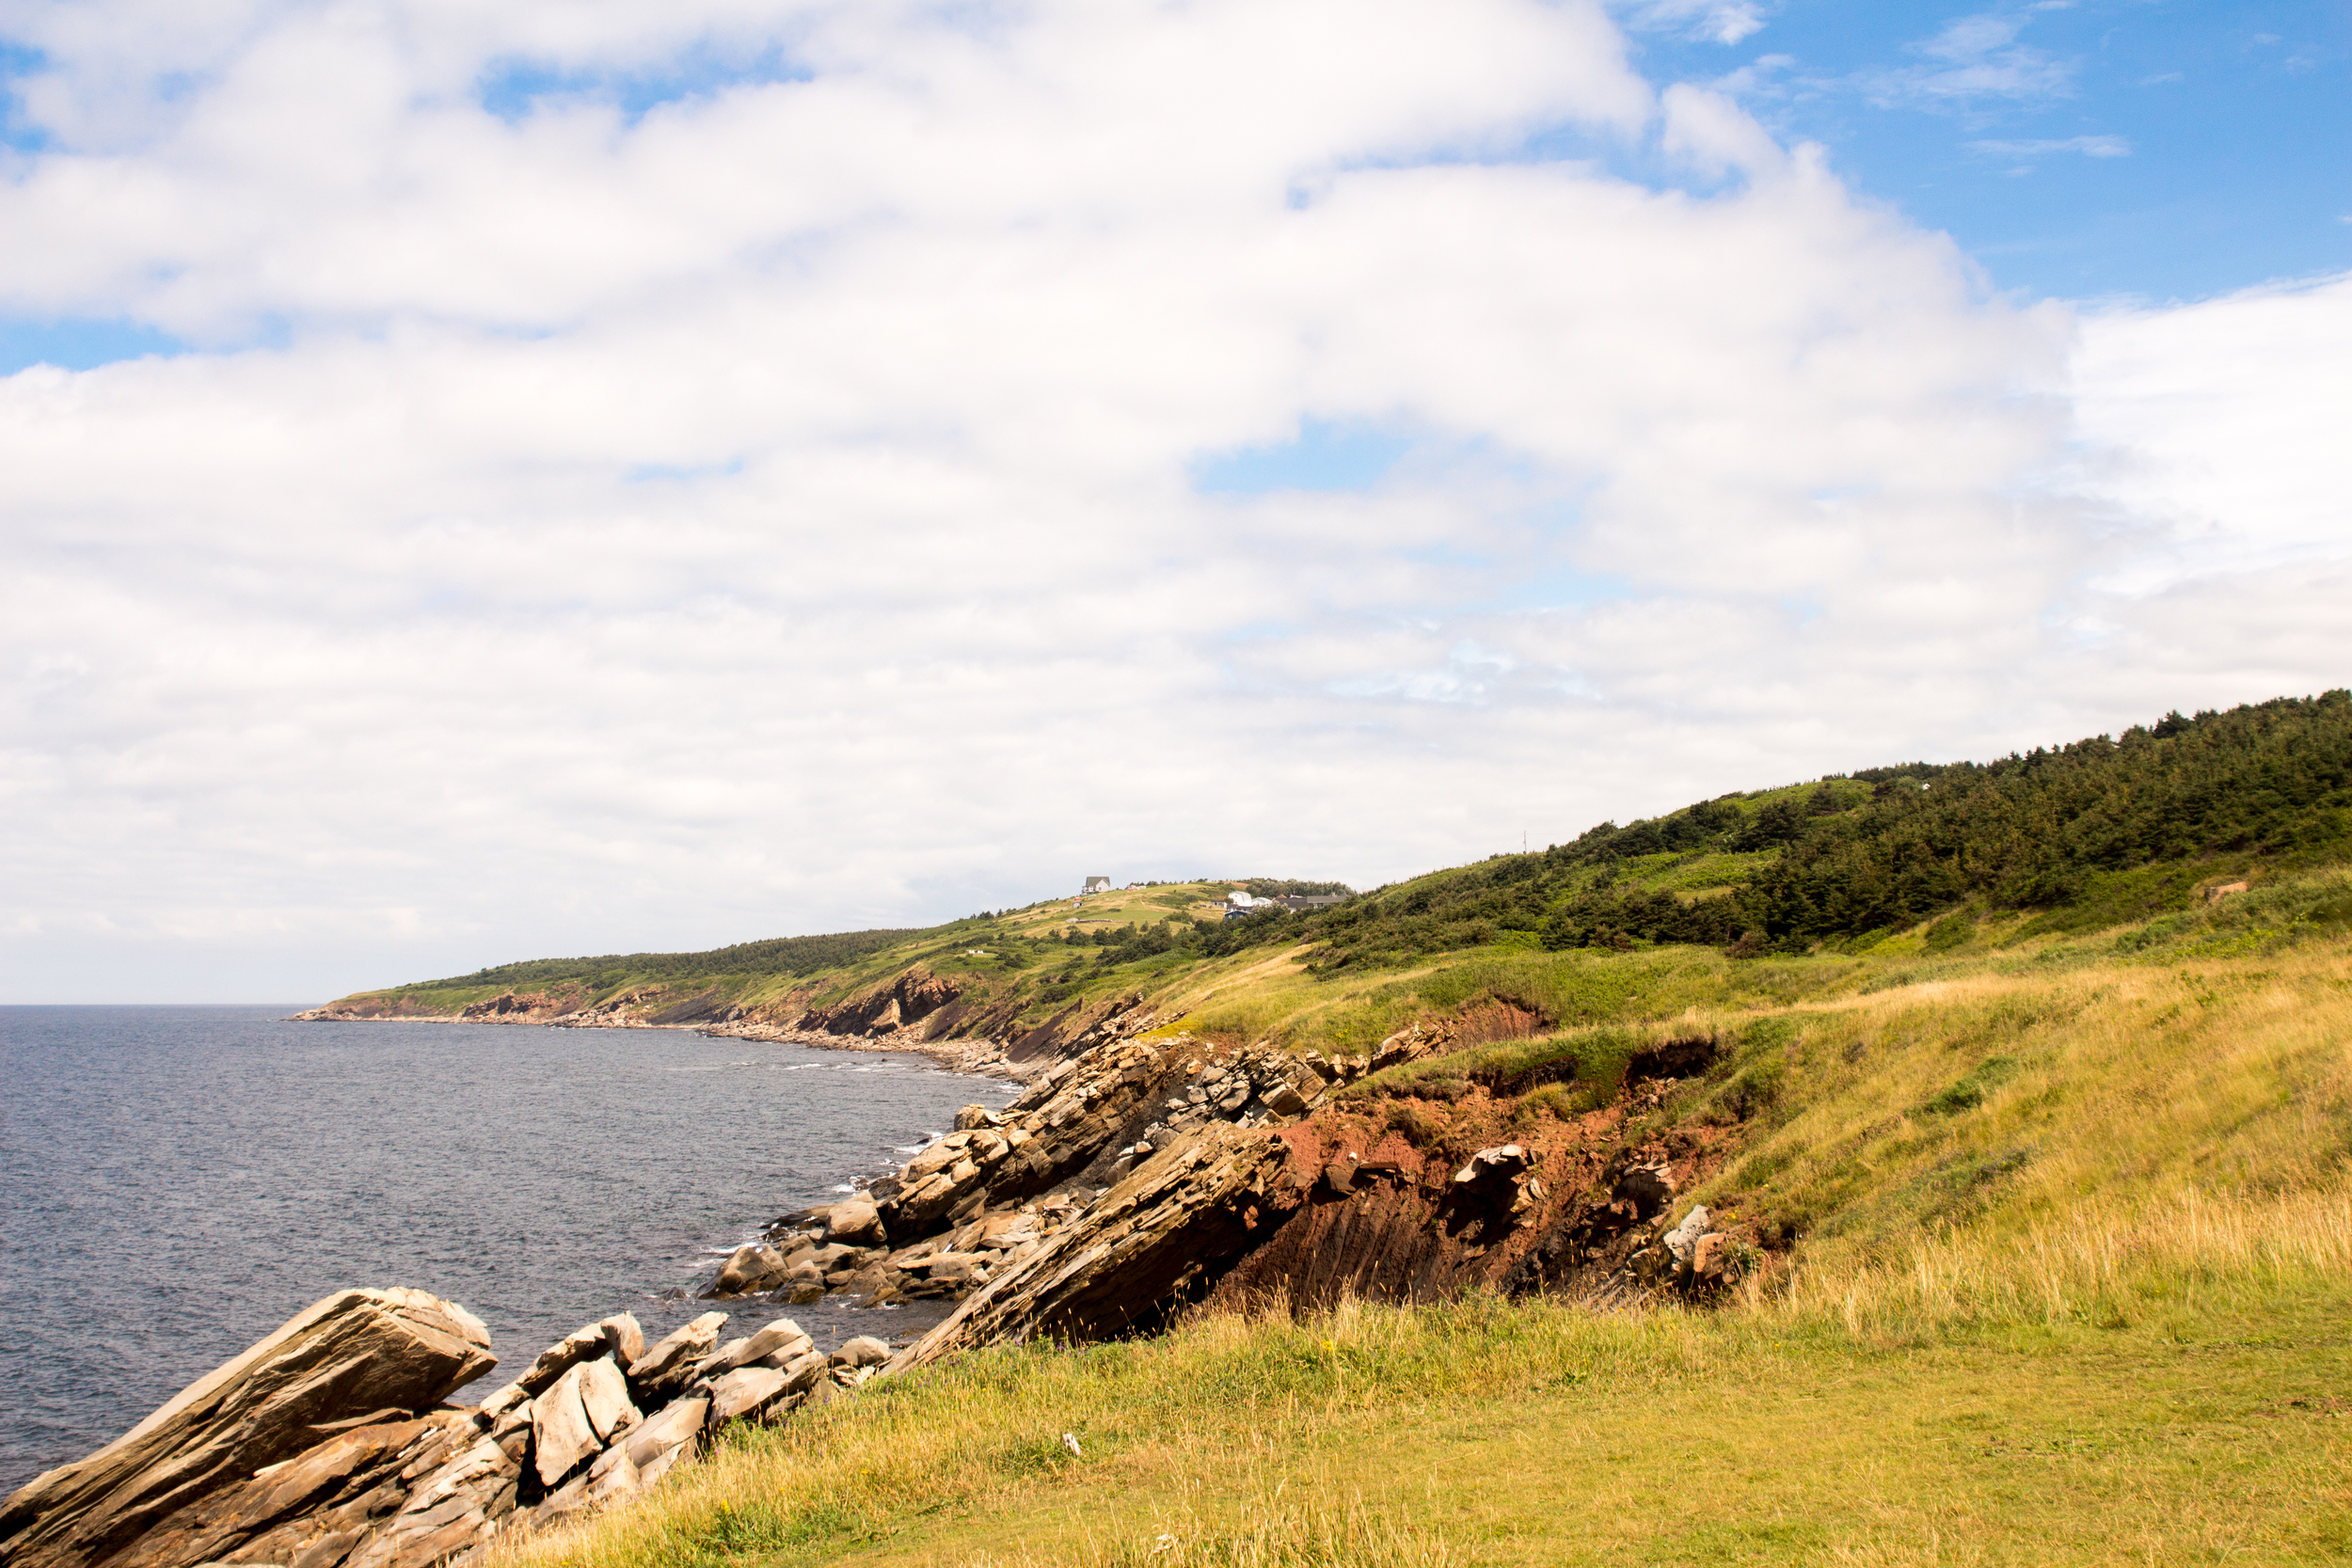 The Cabot Trail. Cape Breton.